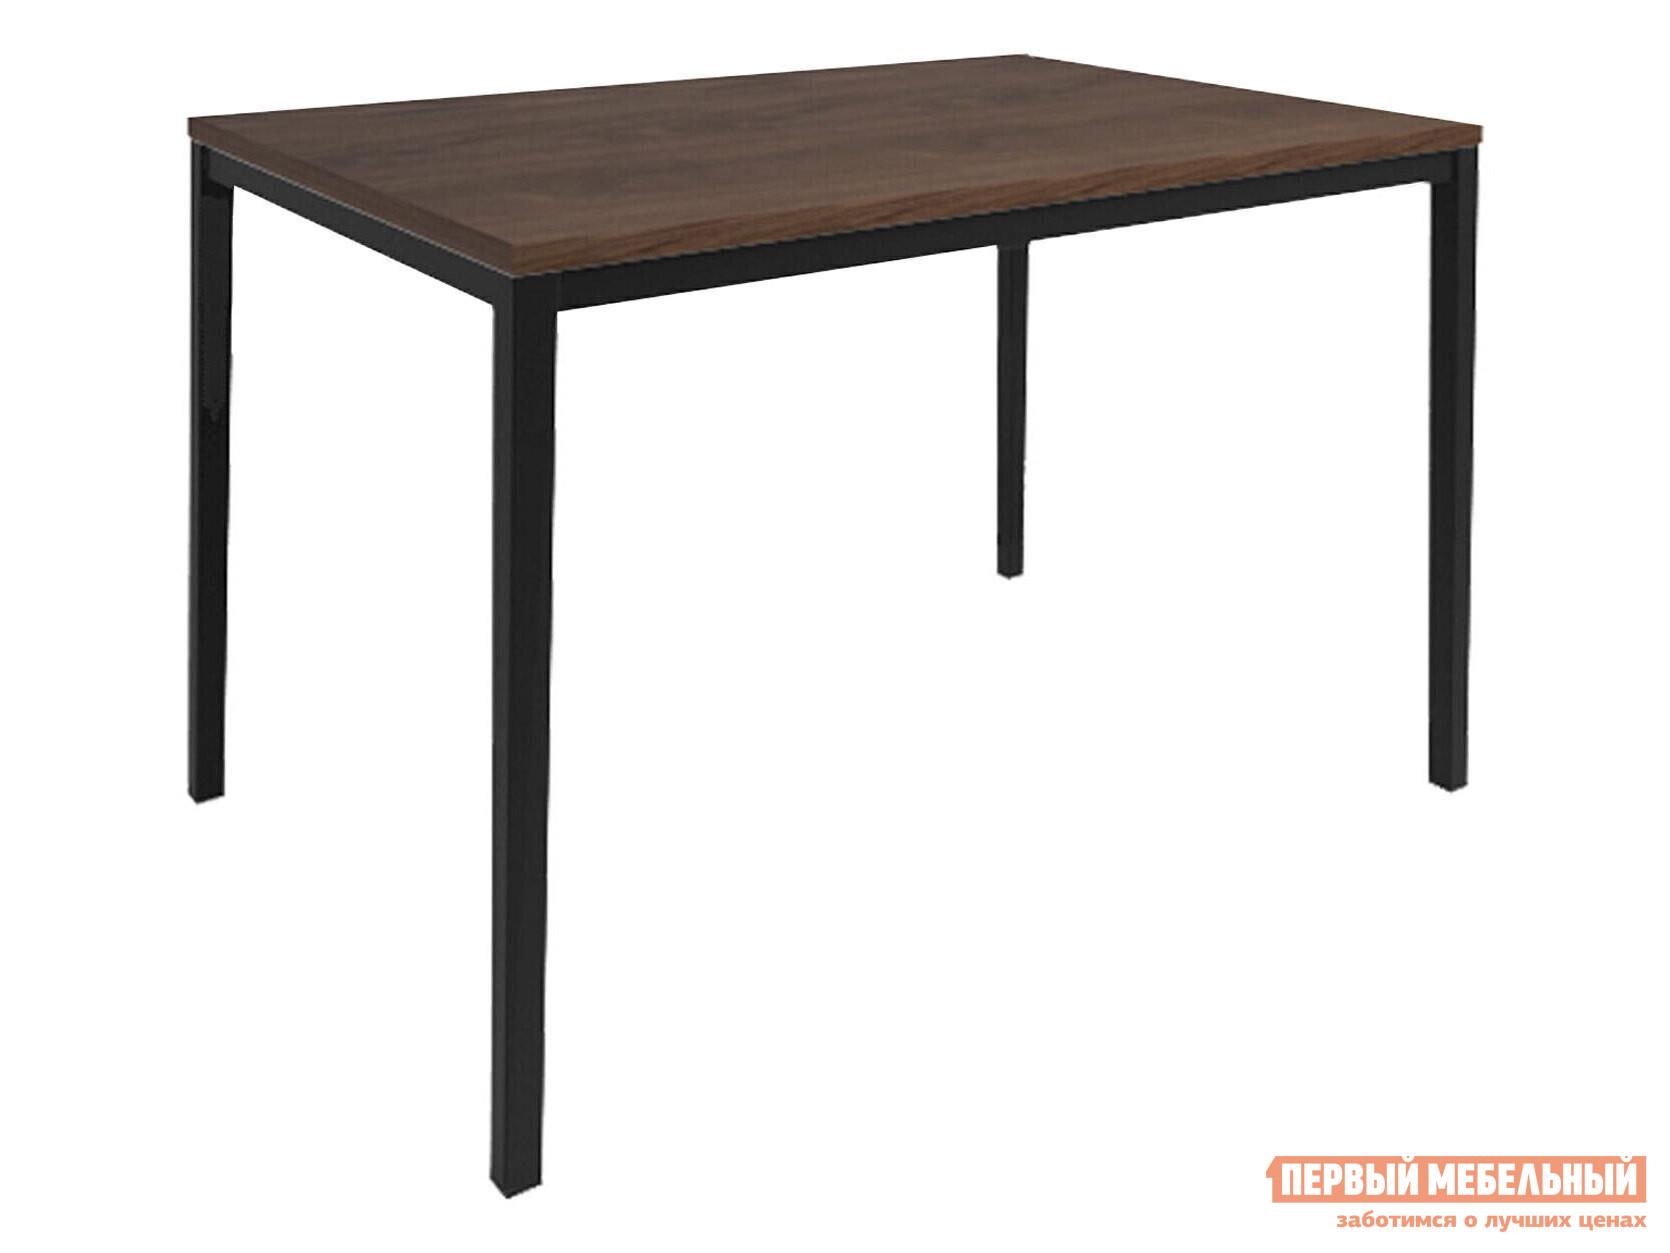 Кухонный стол  Обеденный Итан Дуб Кантри / Черный муар, металл Мебвилл 124108